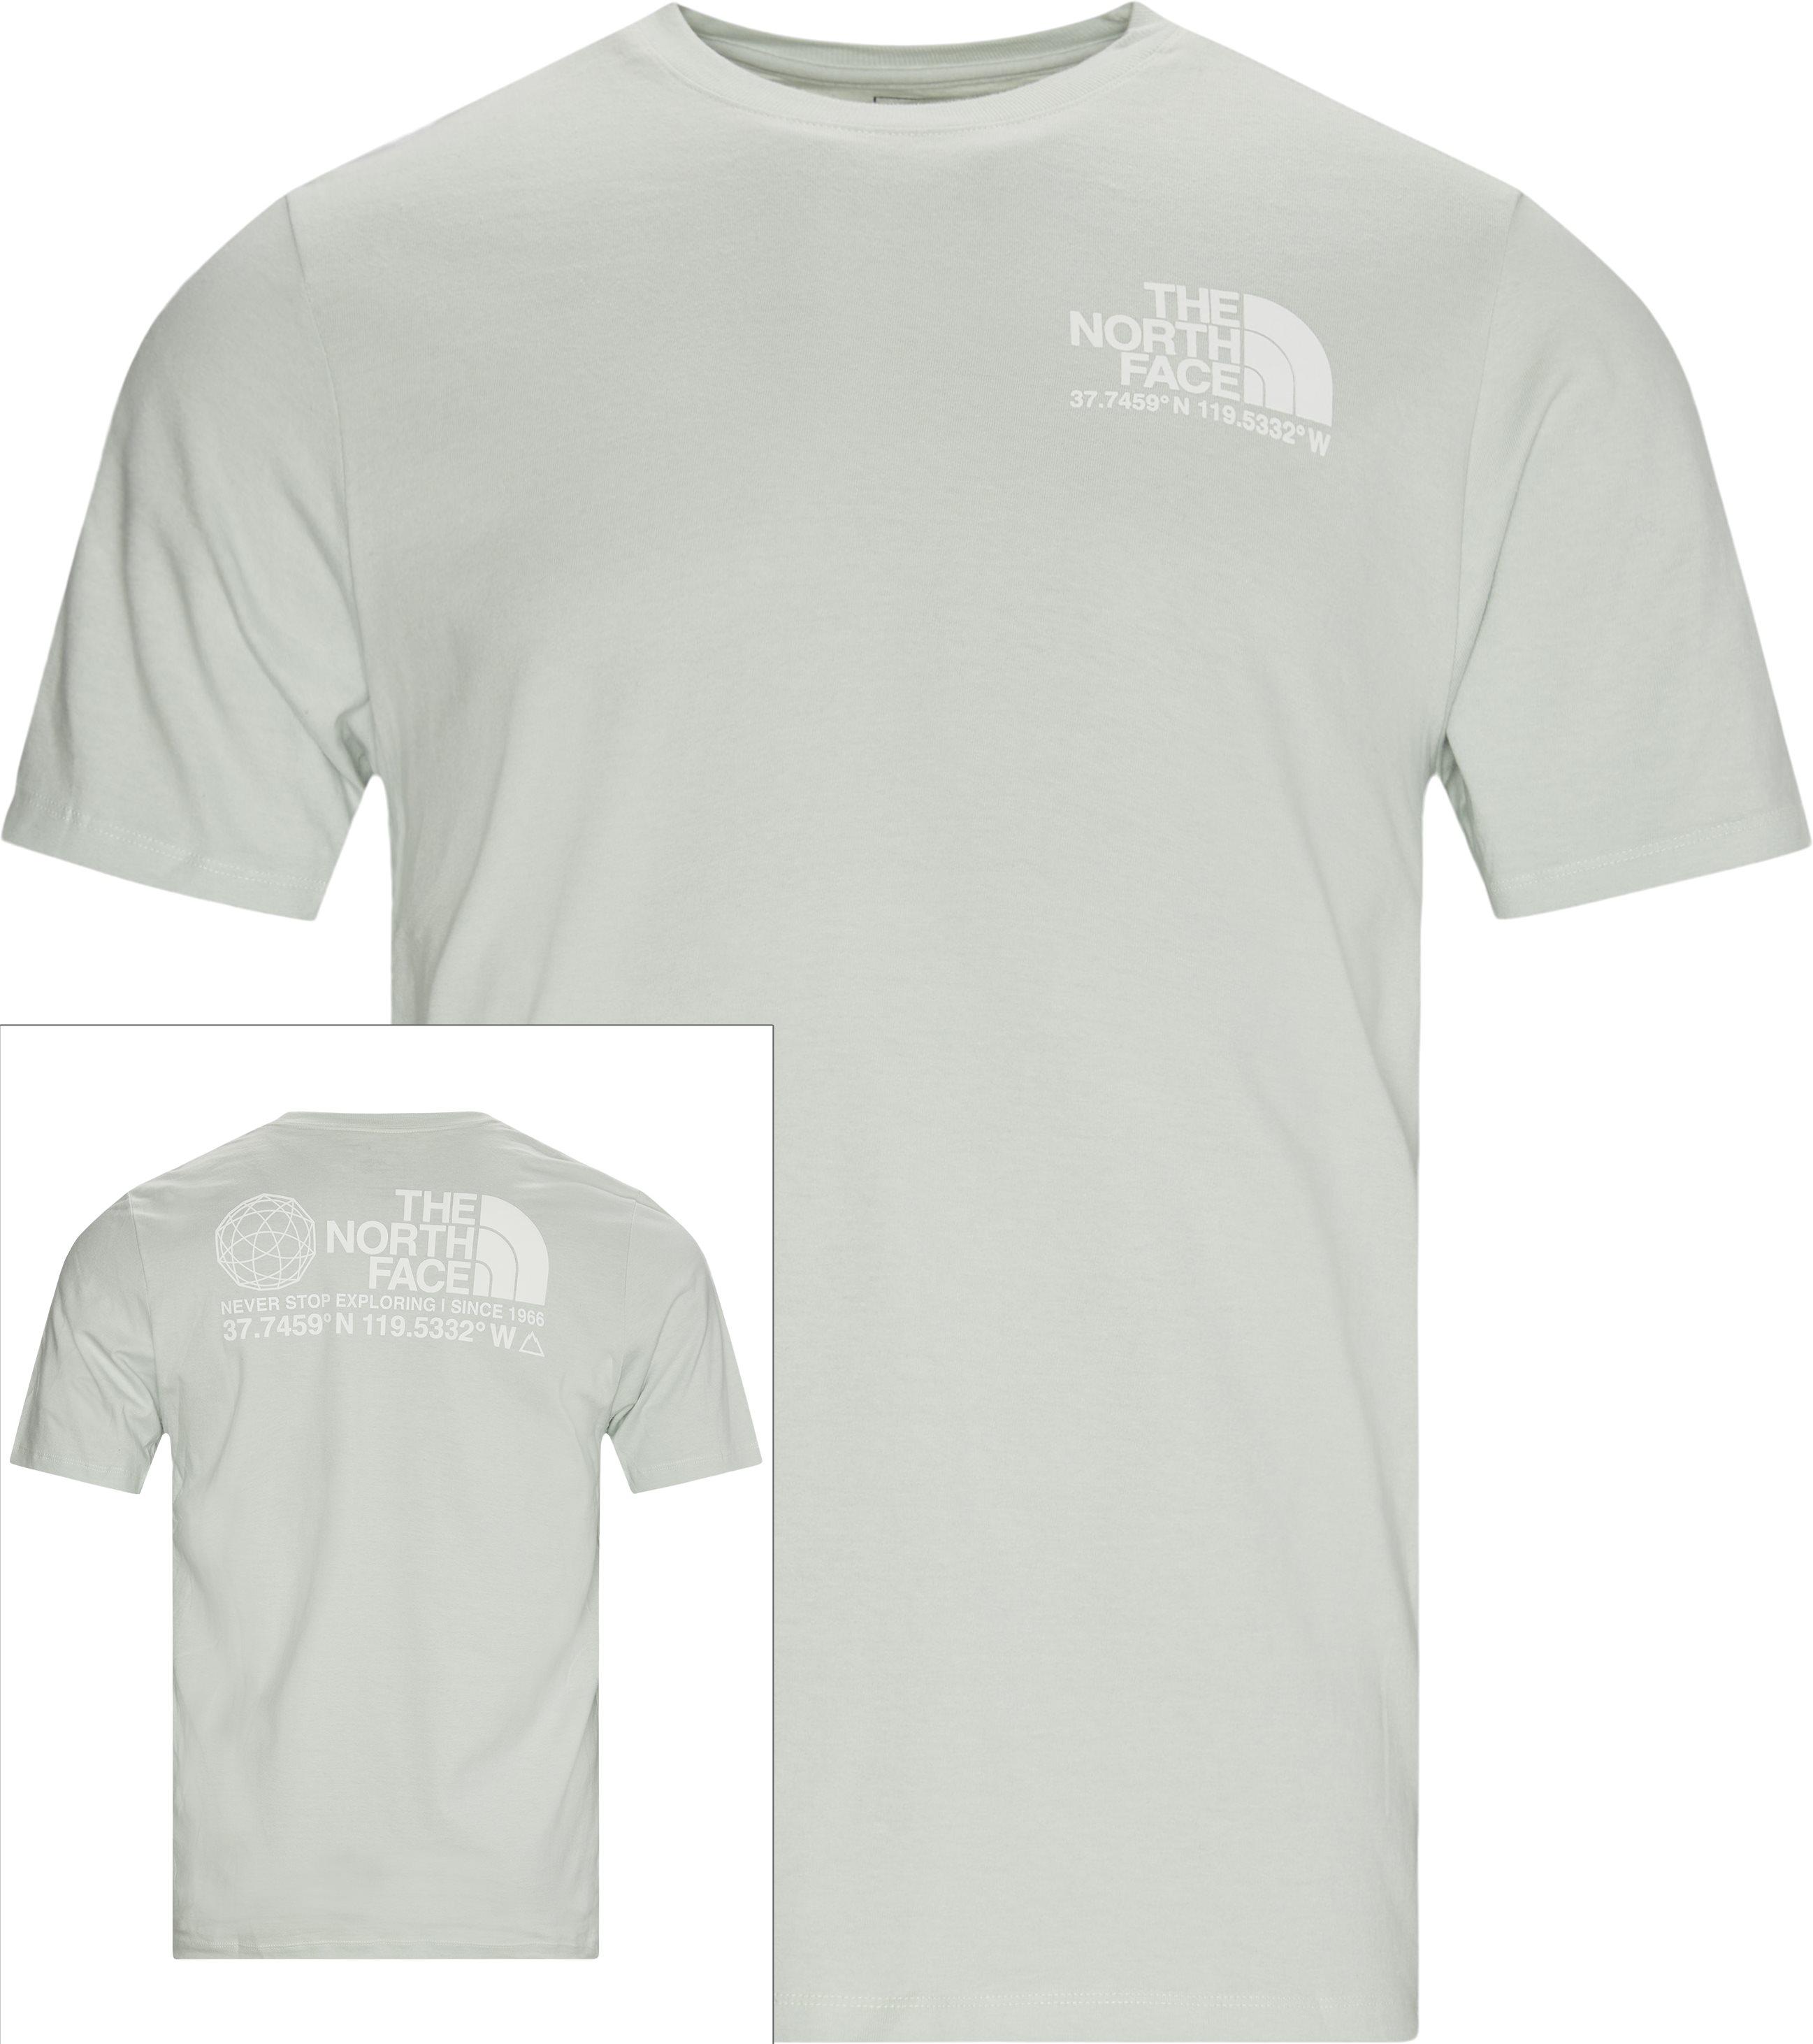 Coordinates Tee - T-shirts - Regular - Grön